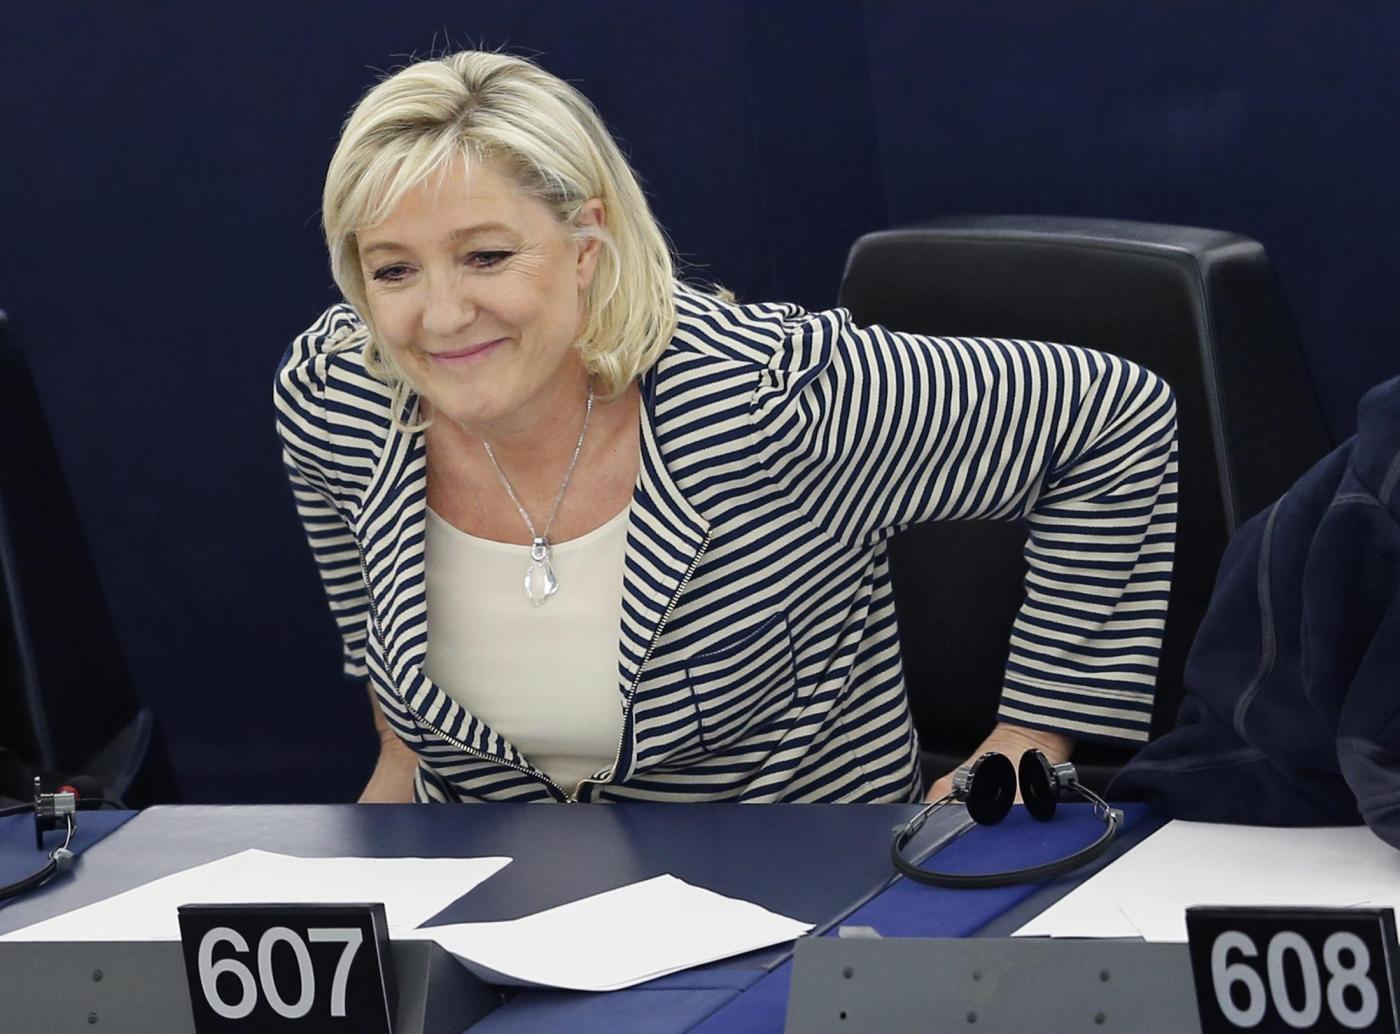 Strasburgo, re di Giordania al parlamento europeo